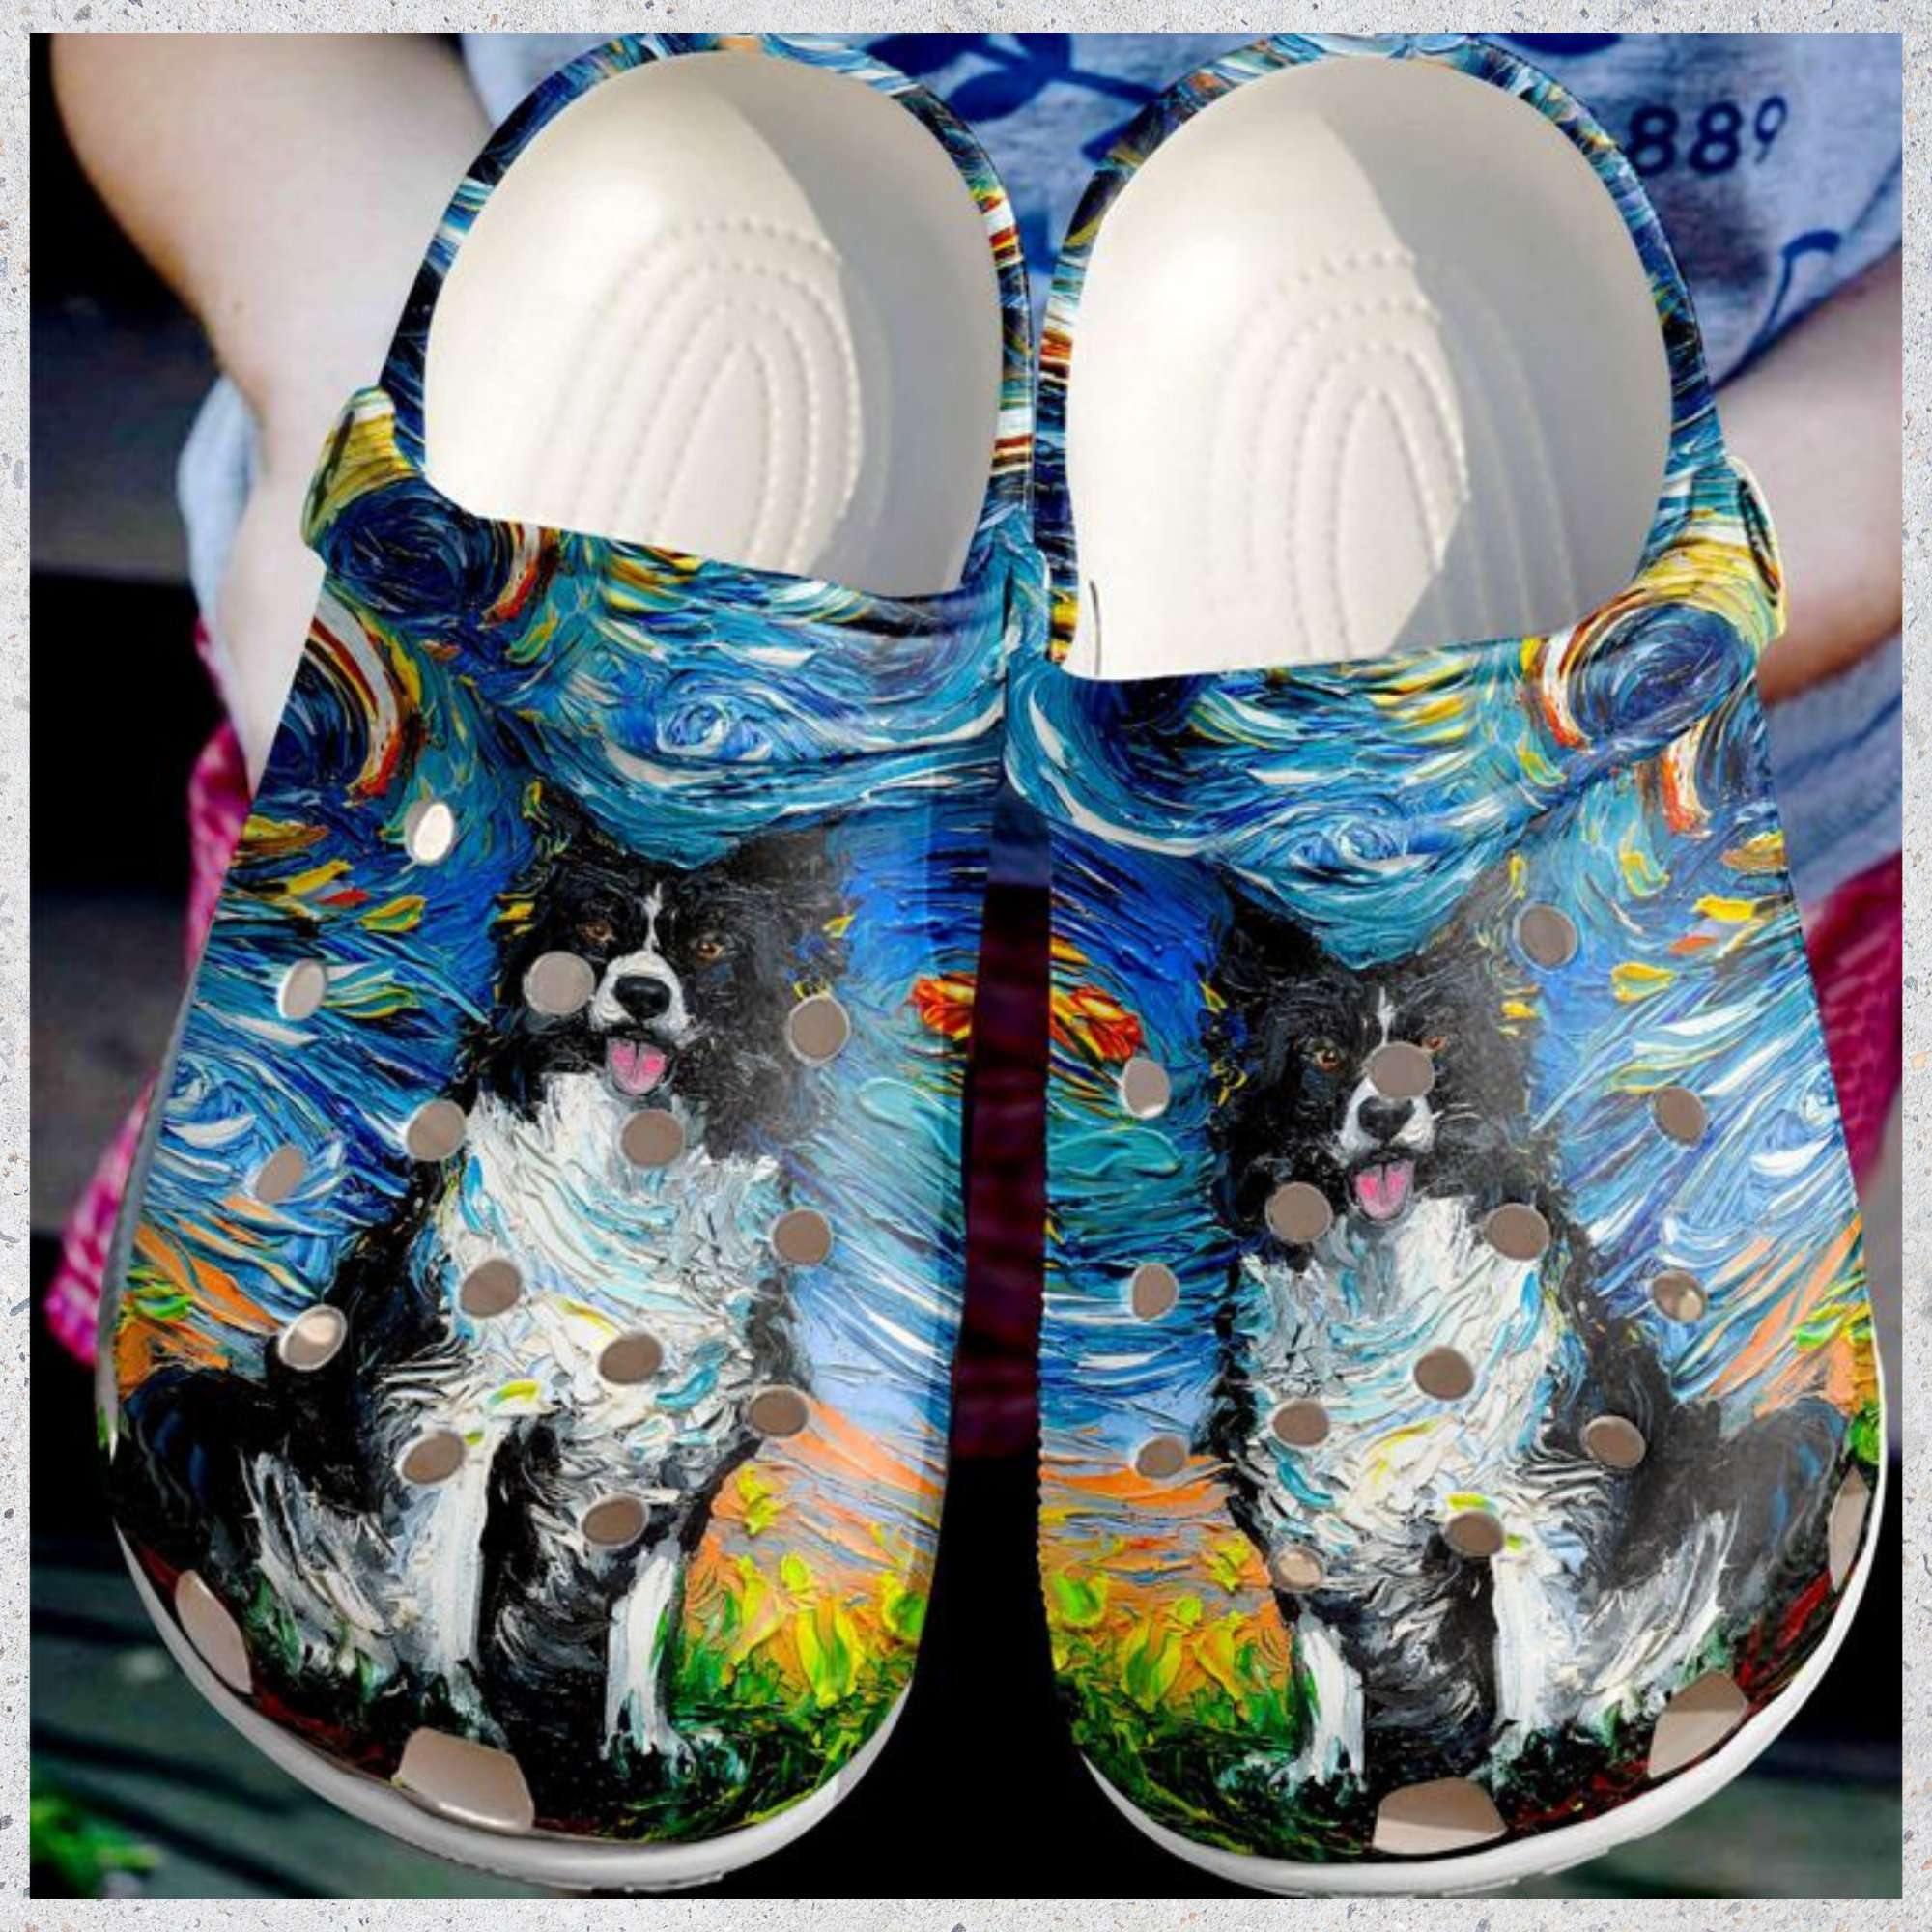 Border Collie Night Crocs Clog Shoes